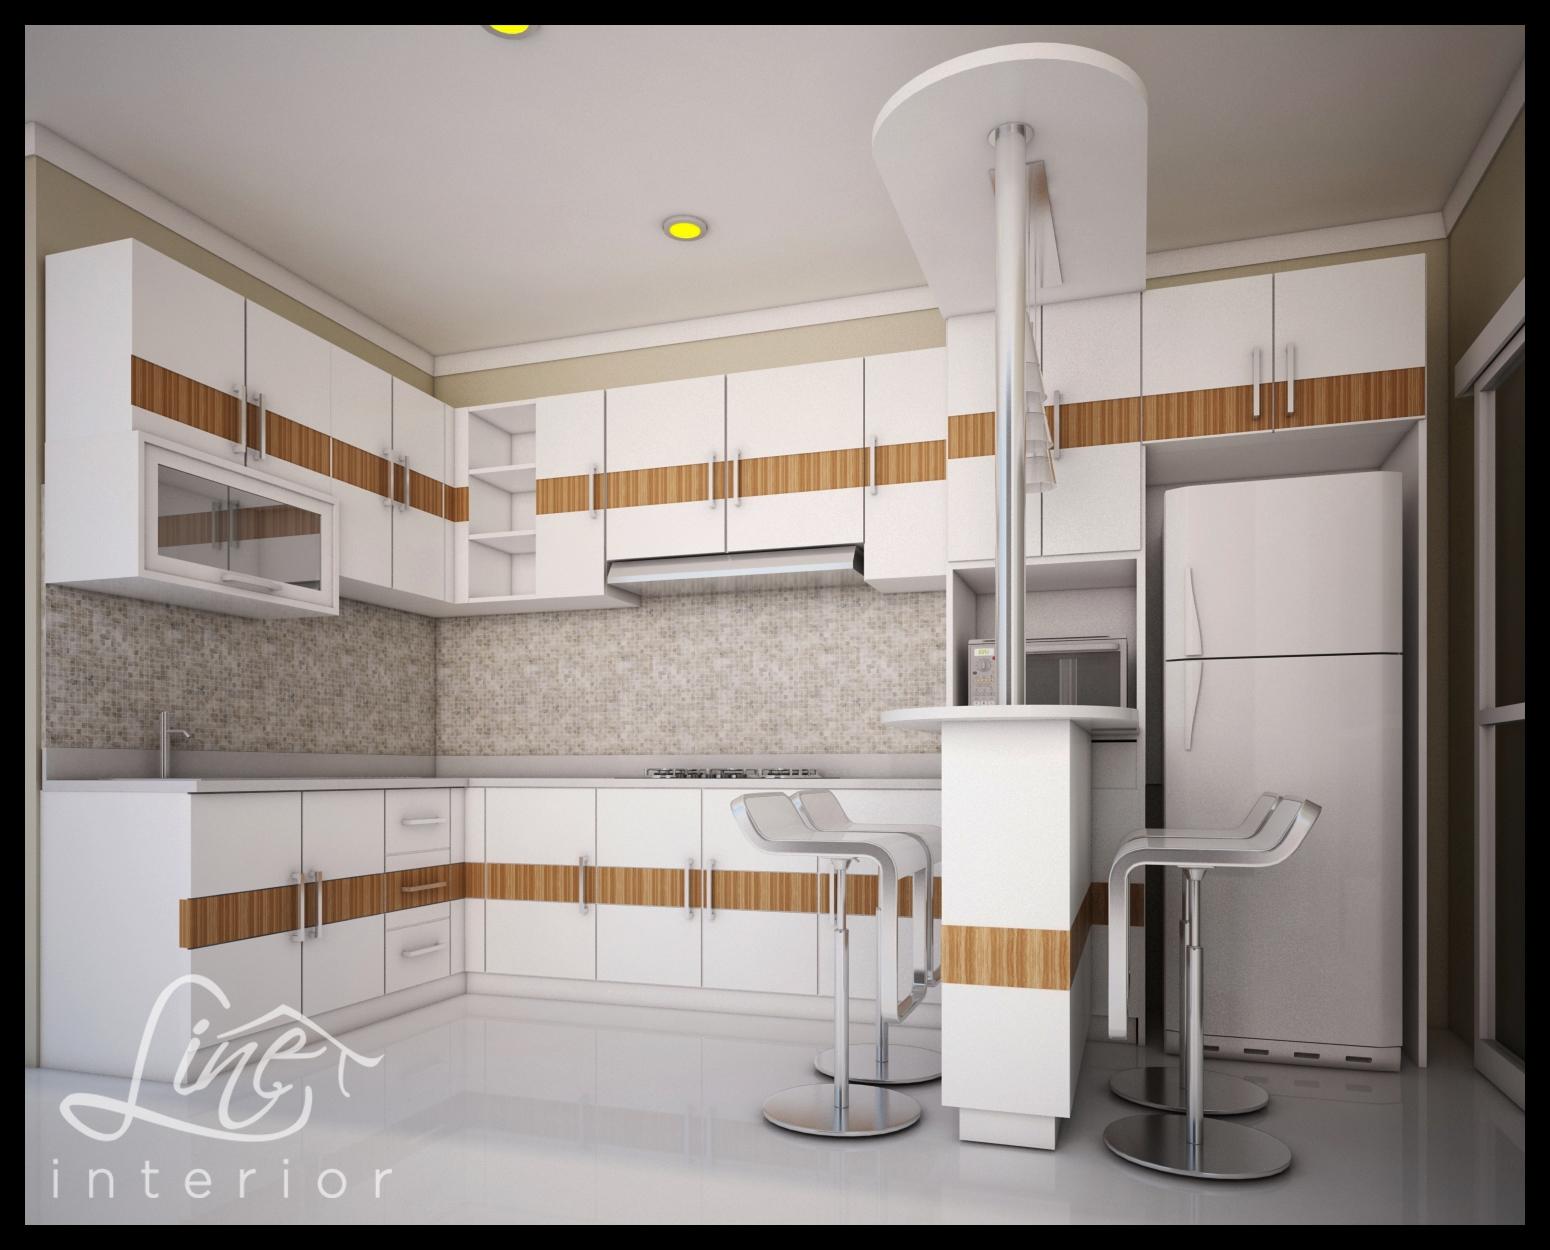 Desain Dapur Malang Dapur Minimalis